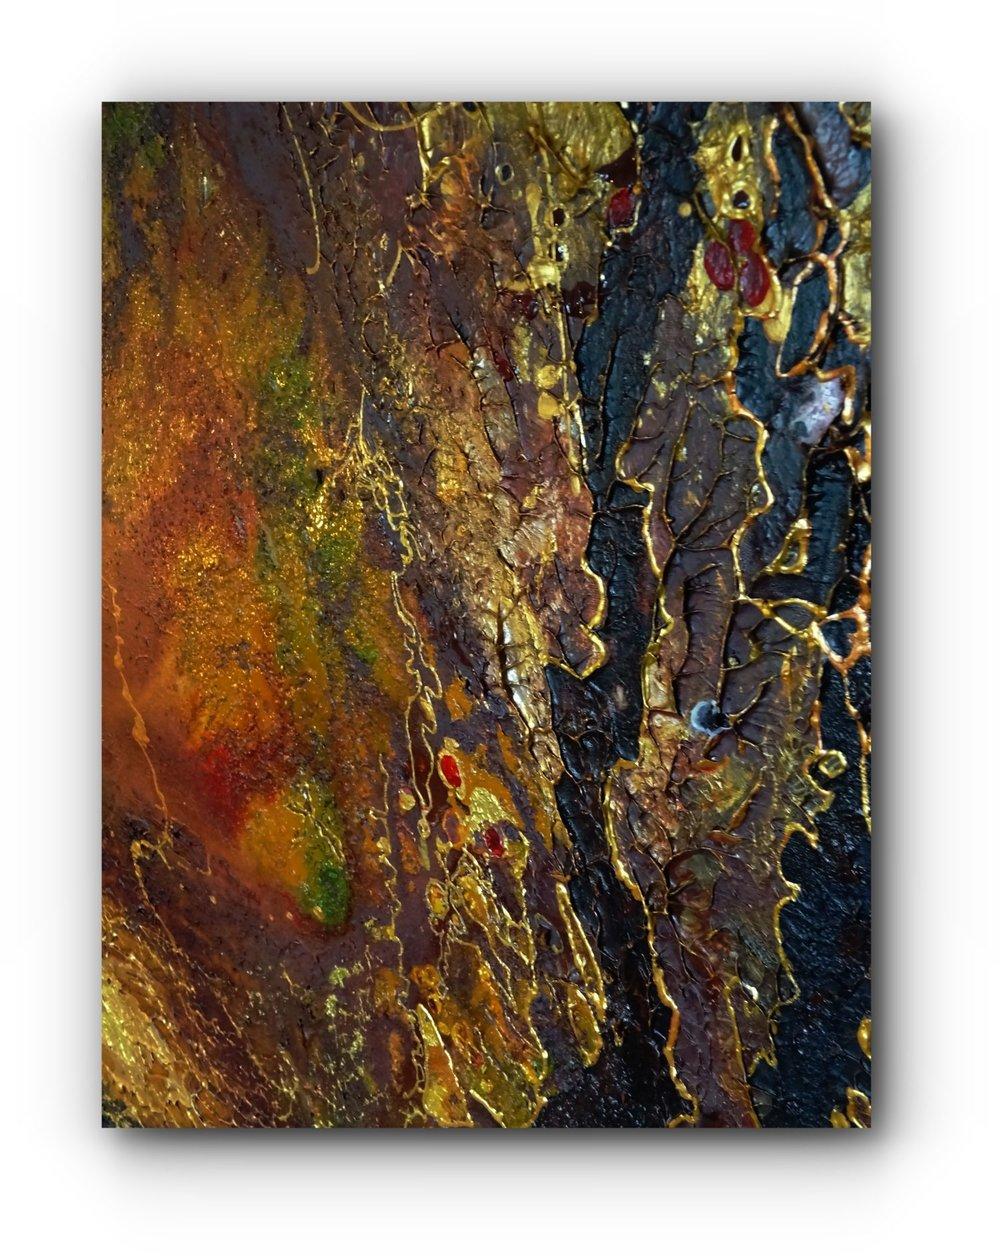 painting-detail-22-golden-sanctuary-artists-ingress-vortices.jpg